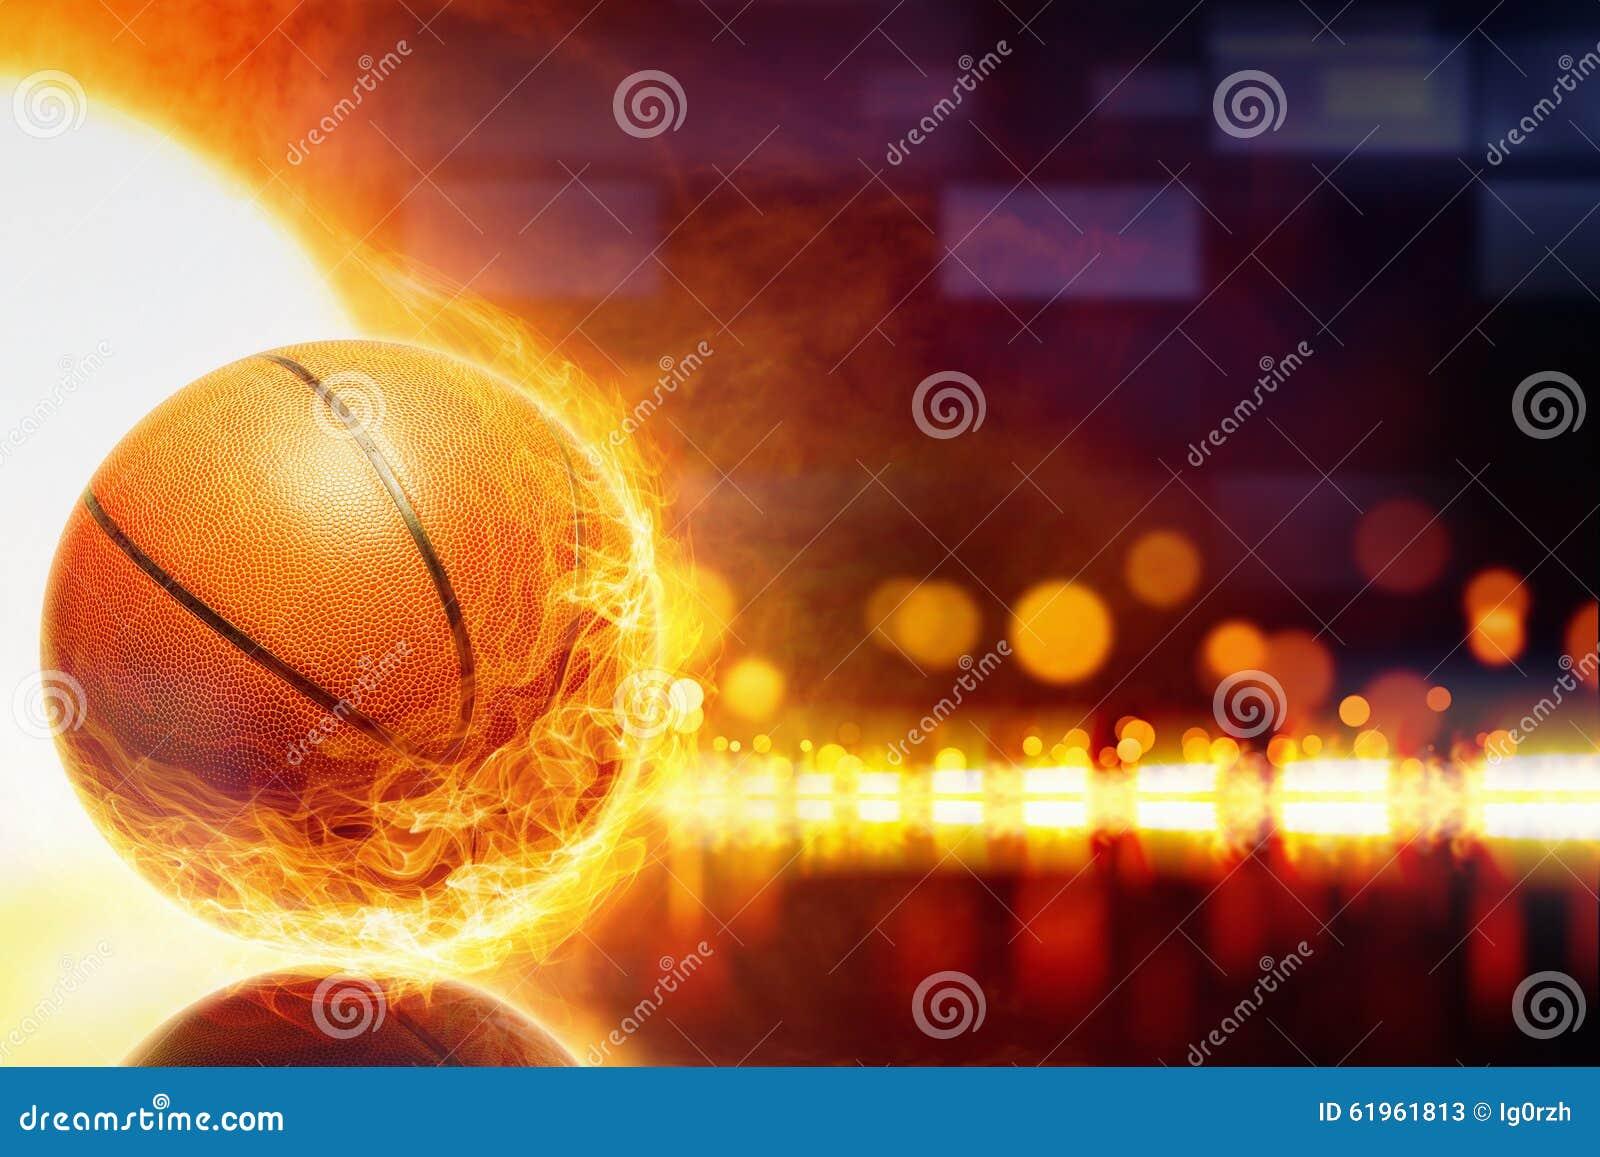 Abstract Sports Background Royalty Free Stock Image: Burning Basketball Stock Photo